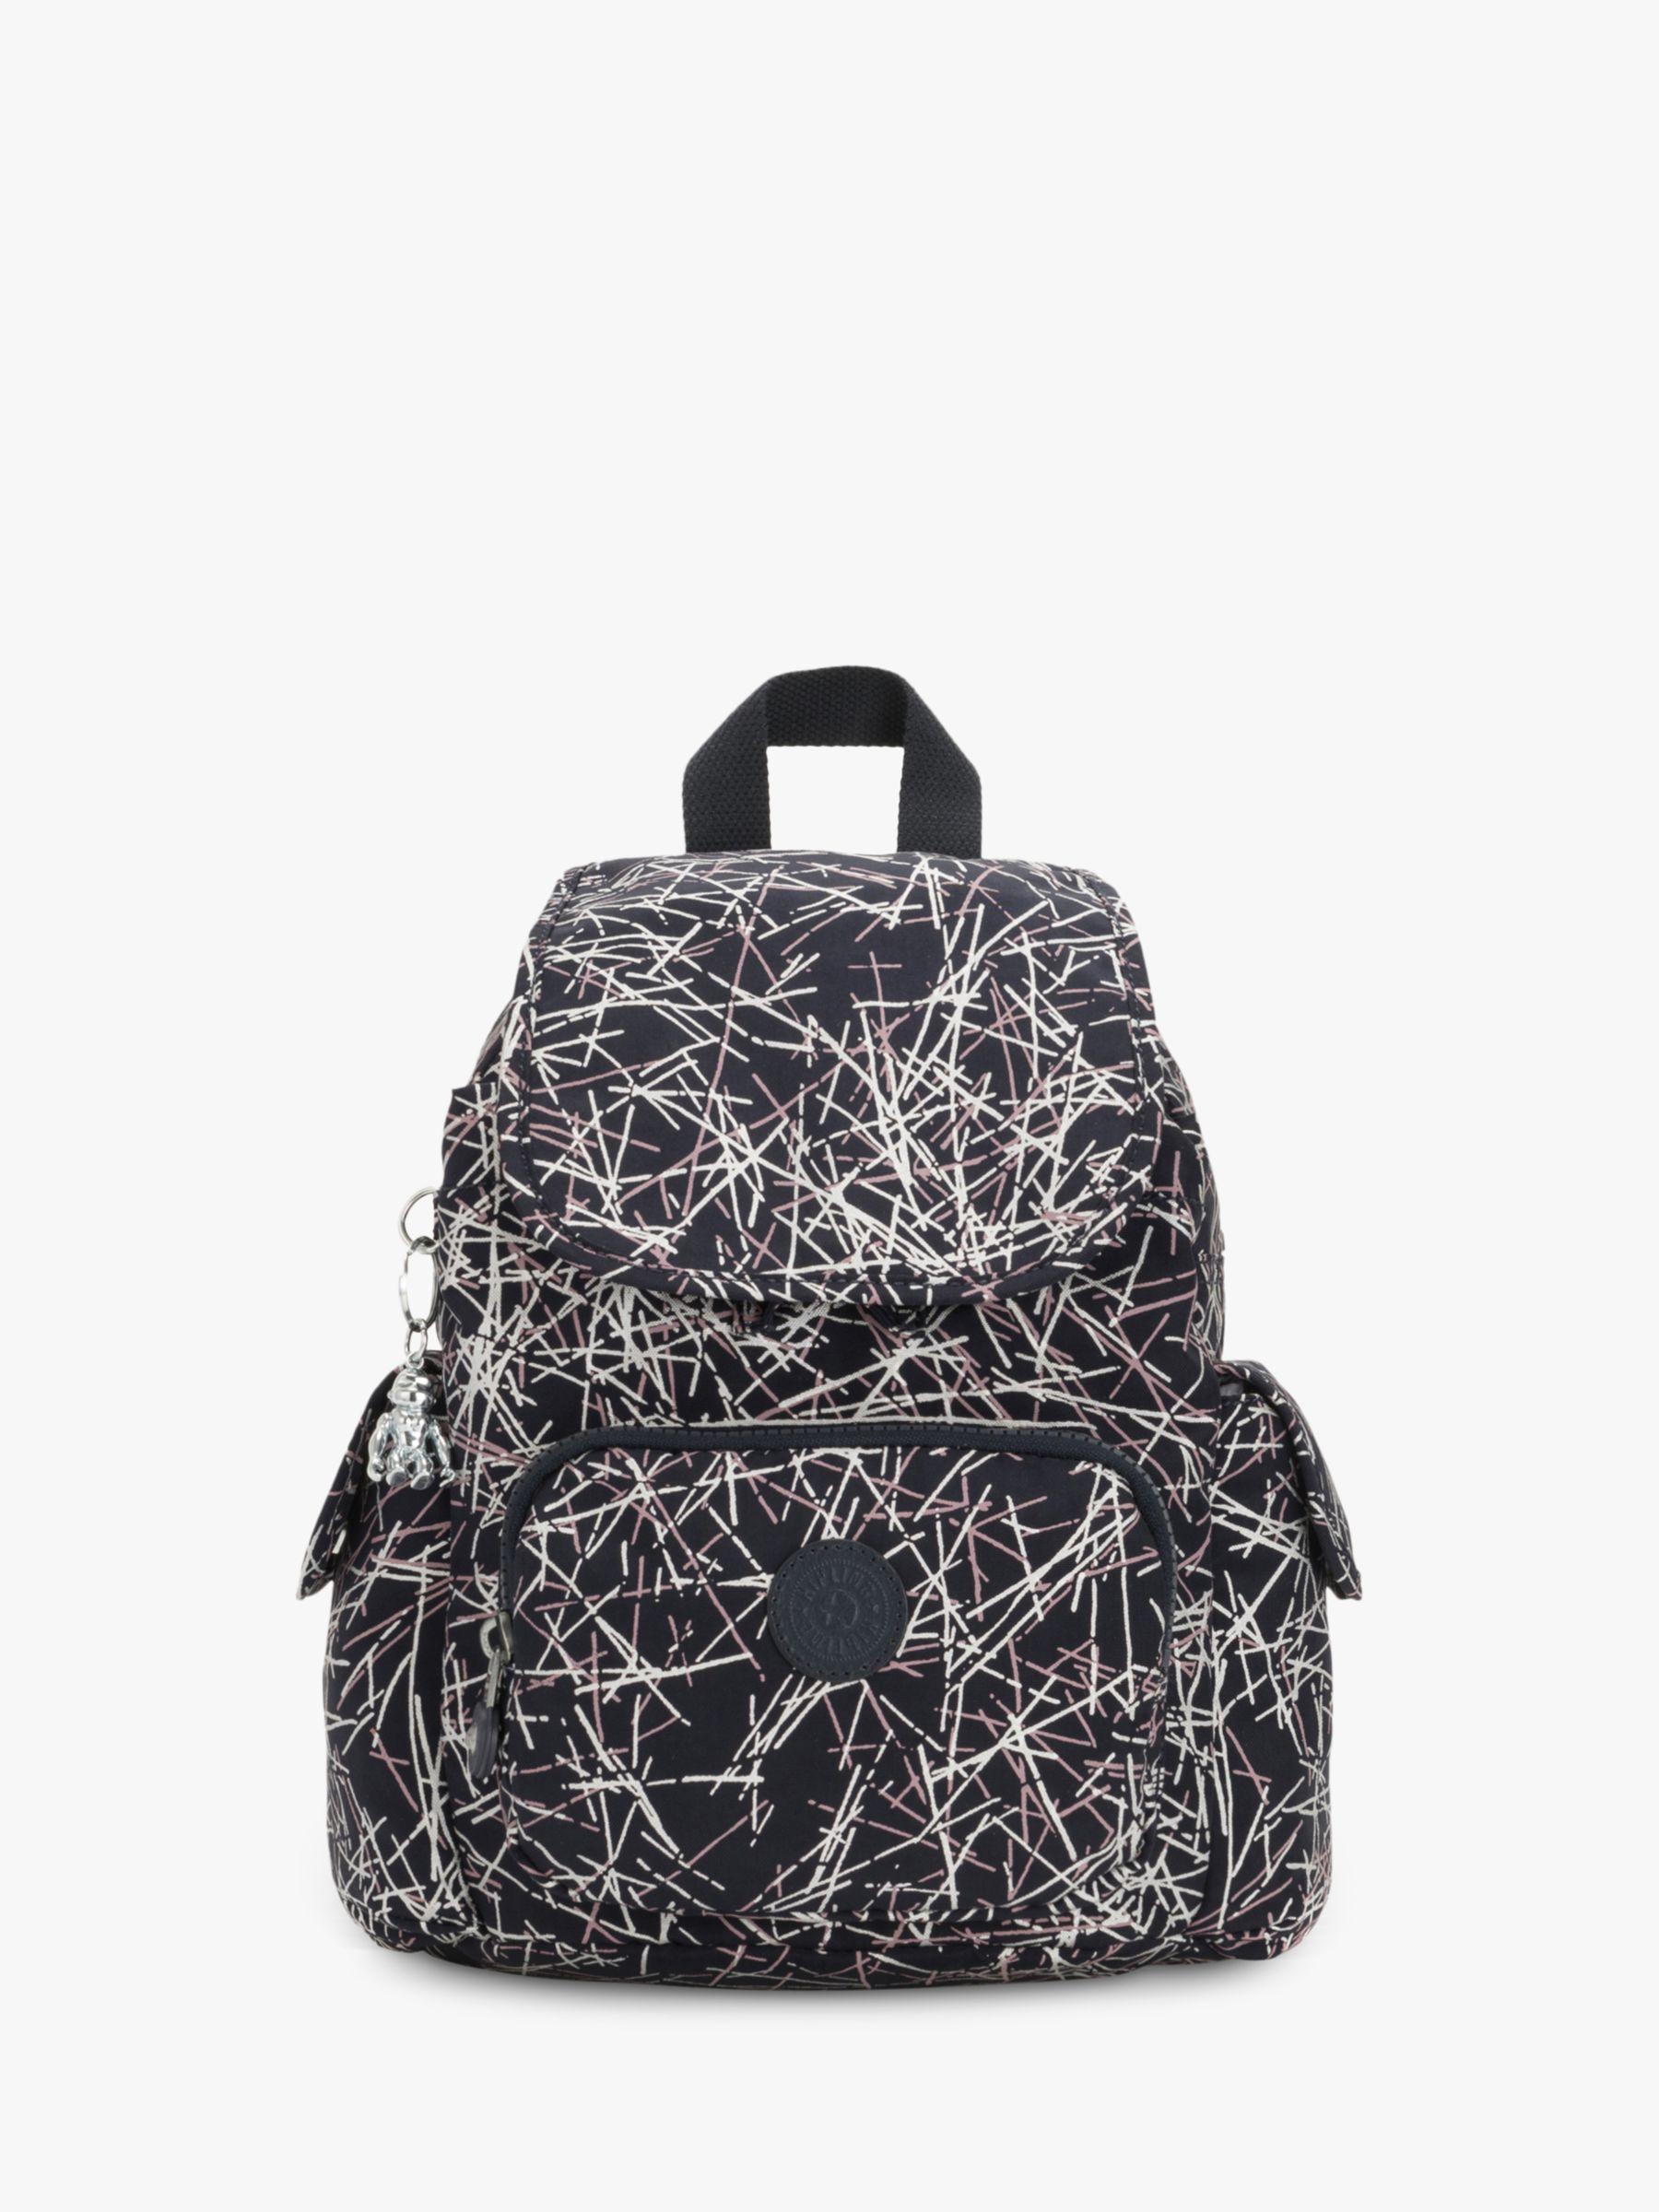 Kipling Kipling City Pack Mini Backpack, Navy Stick